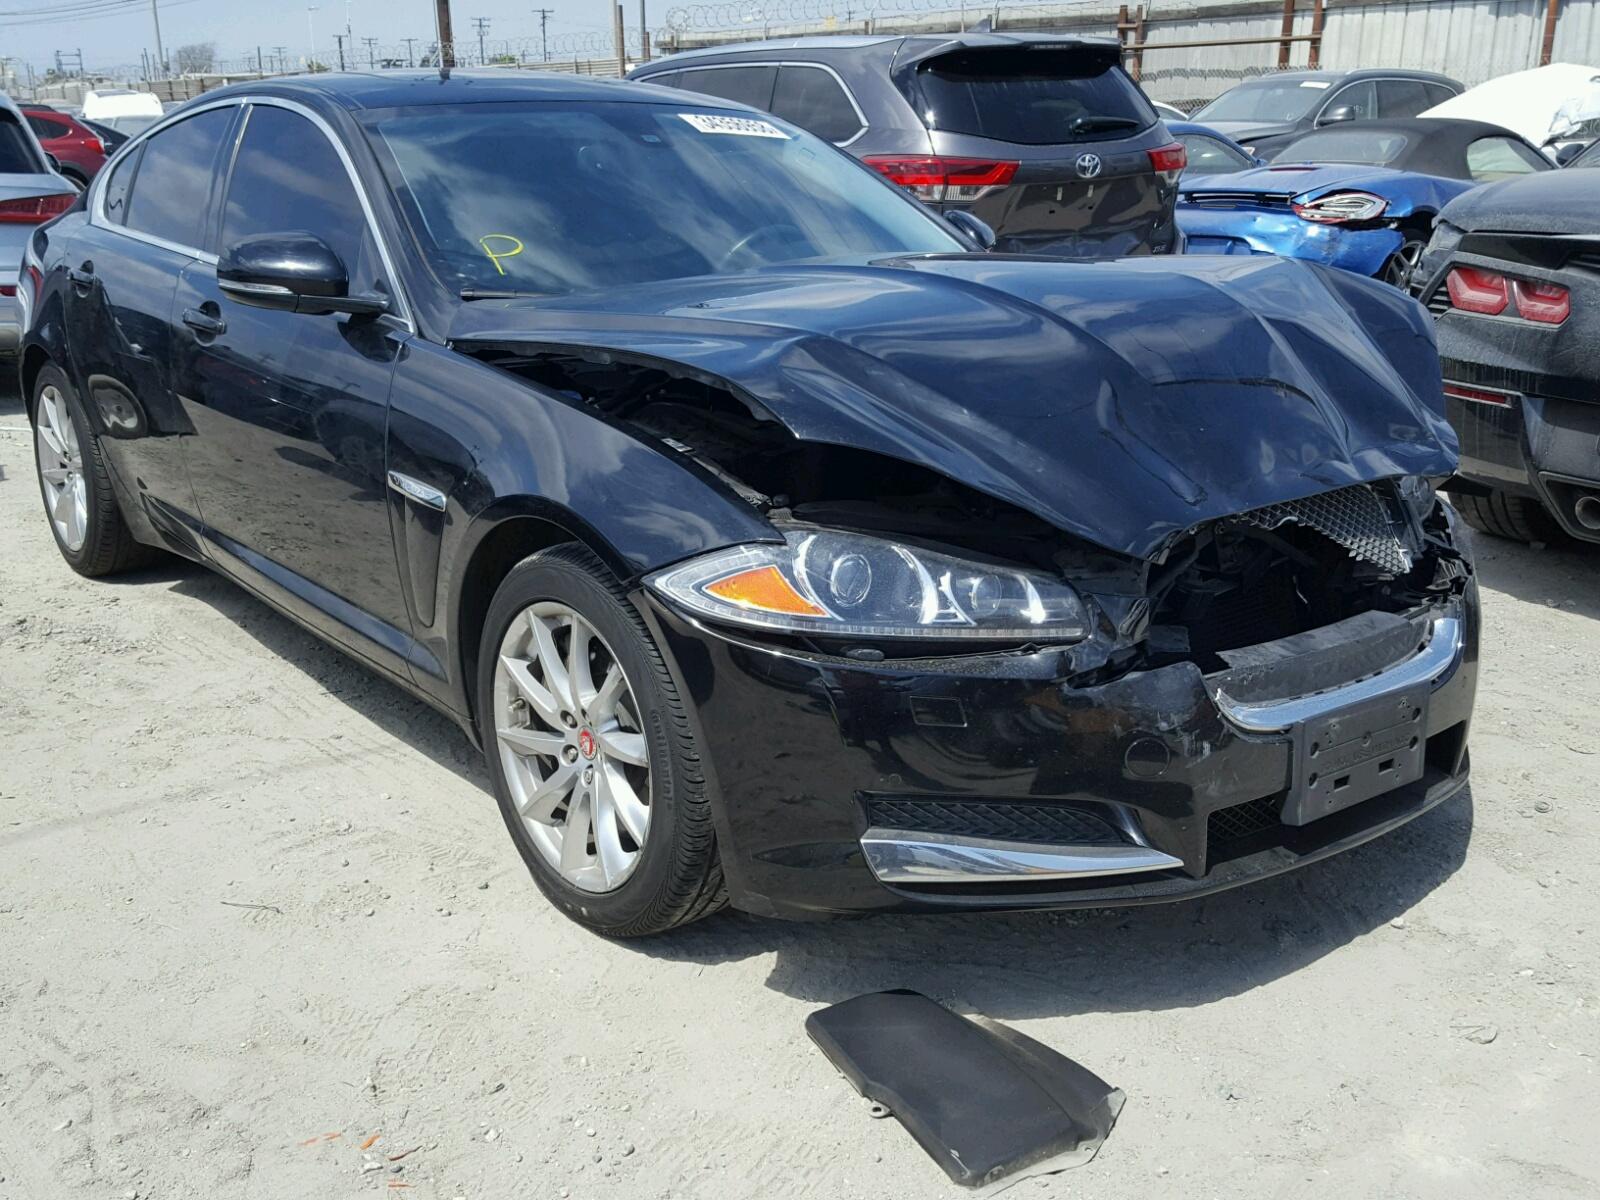 sporty svo project jaguars dealership show a up l new and suv car auto img s angeles jaguar gallery com at la los sv line jaguarforums articles xe